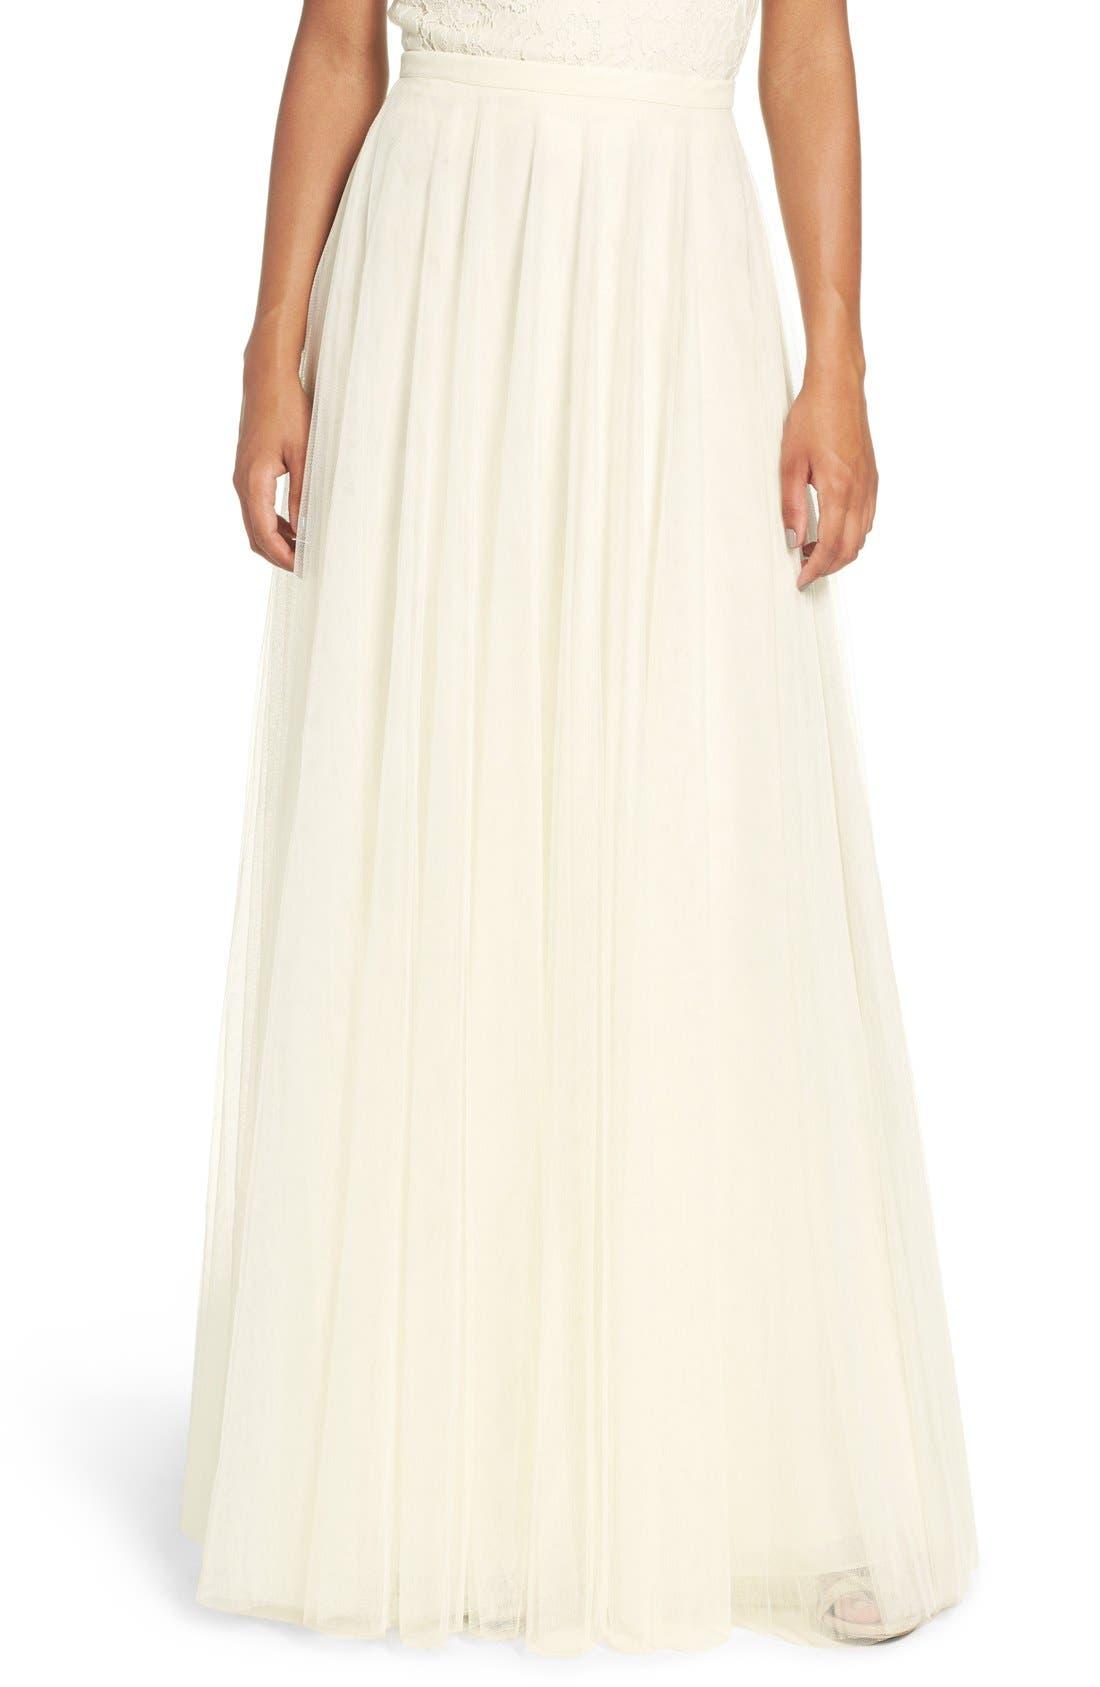 Alternate Image 1 Selected - Jenny Yoo 'Winslow' Long Tulle A-Line Skirt